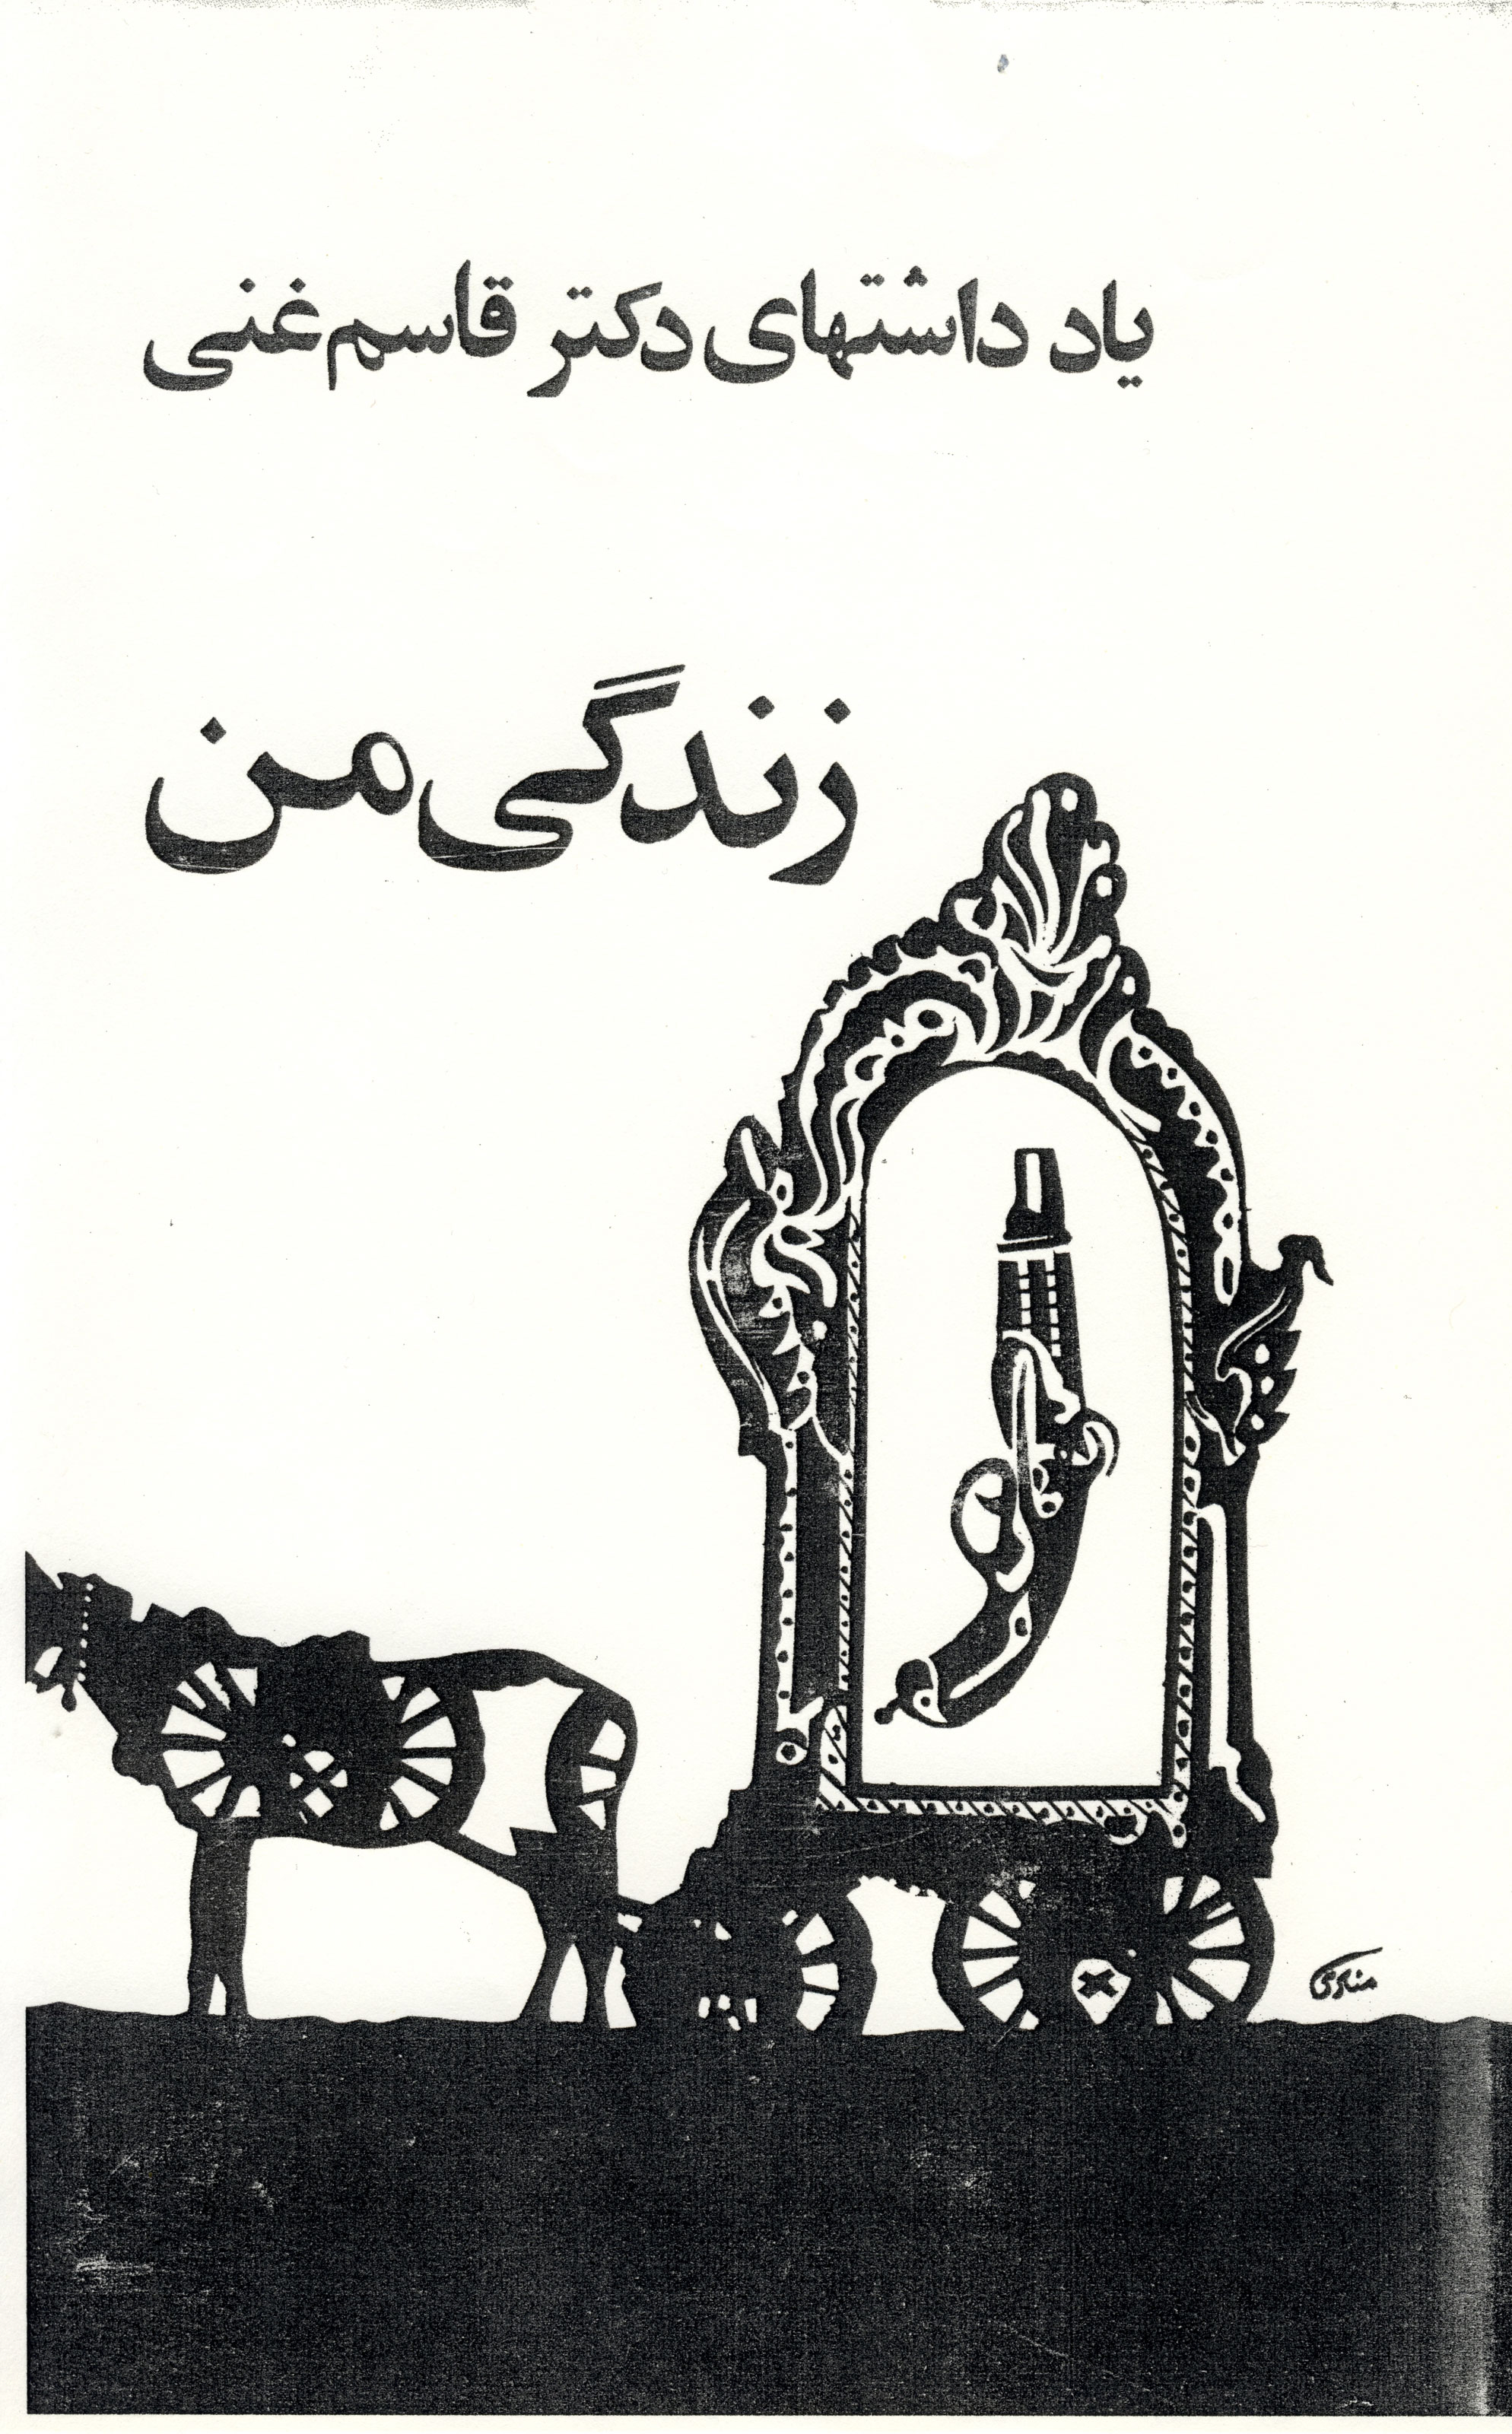 Ghasem-Ghani-2